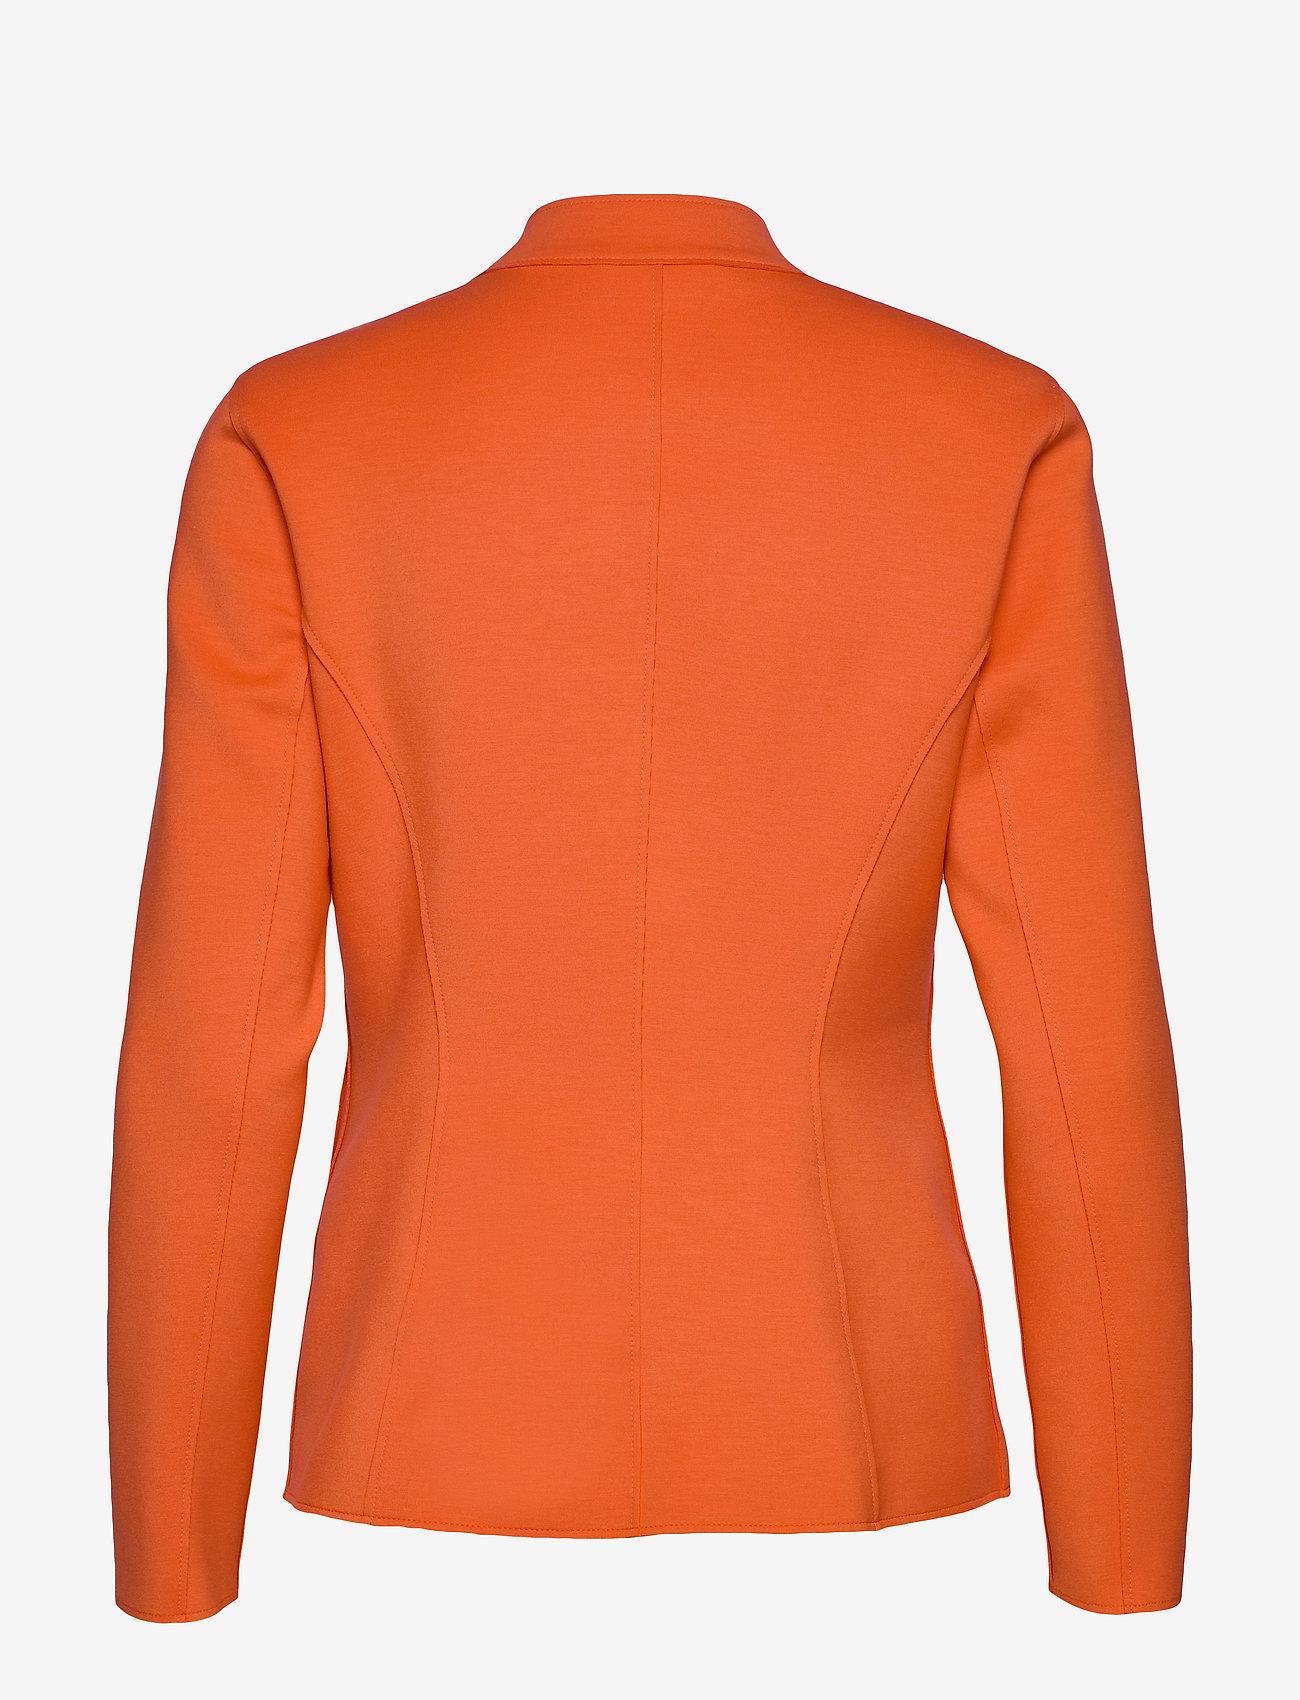 Blazer Long-sleeve (Red Orange) (83.99 €) - Gerry Weber vlF2N